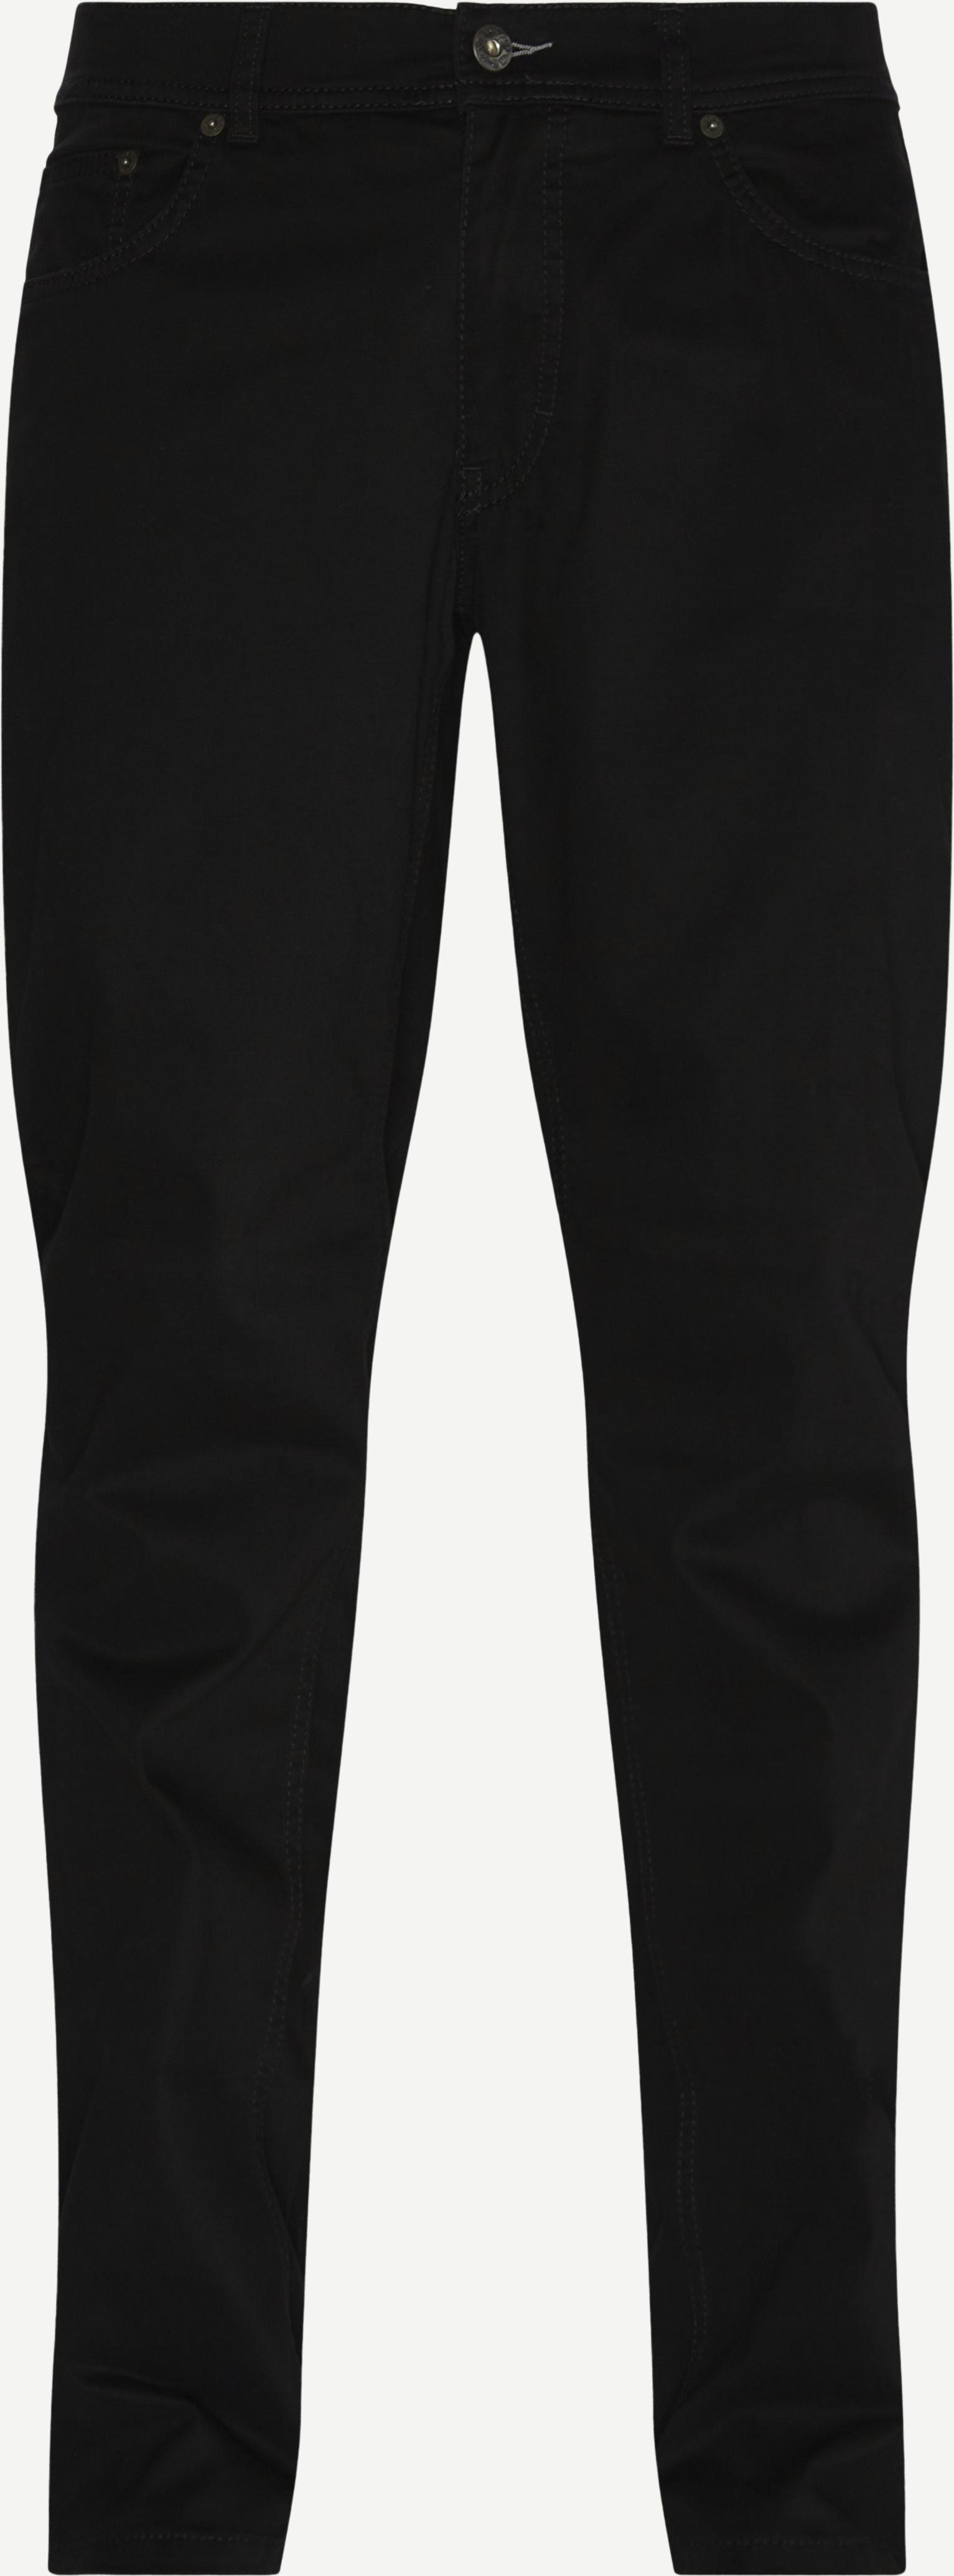 Cooper Jeans - Jeans - Regular - Svart